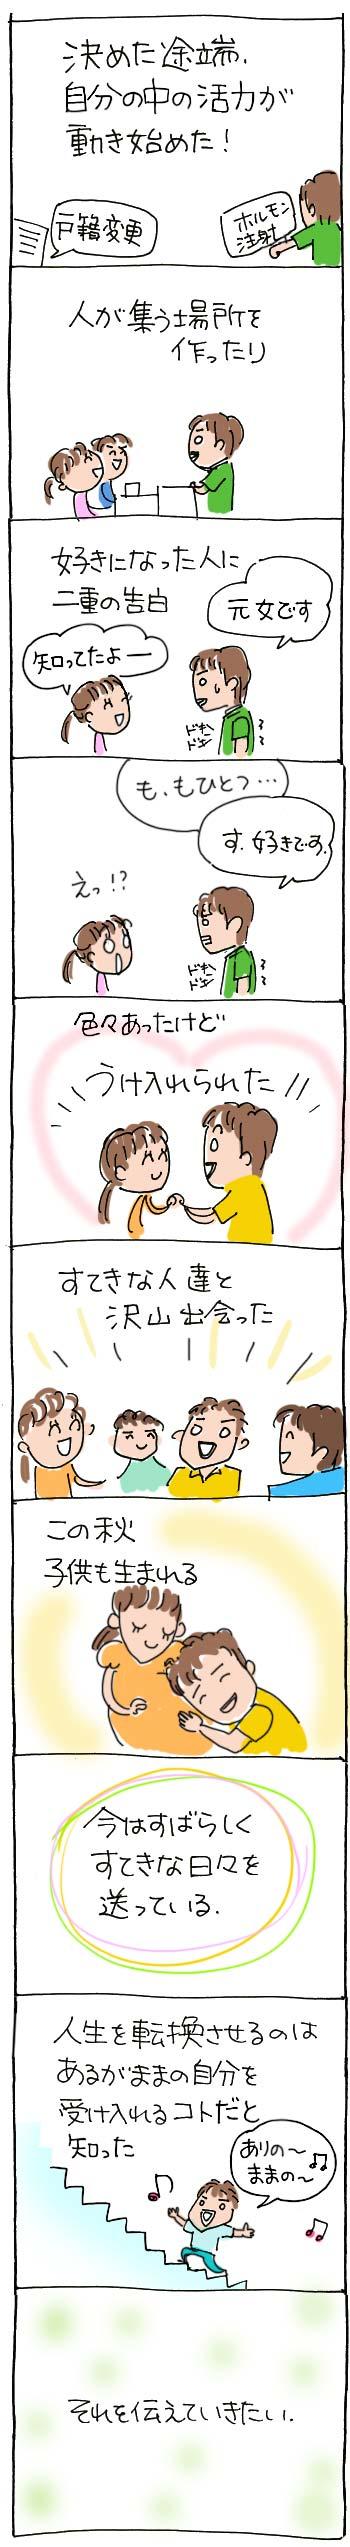 ryo05.jpg